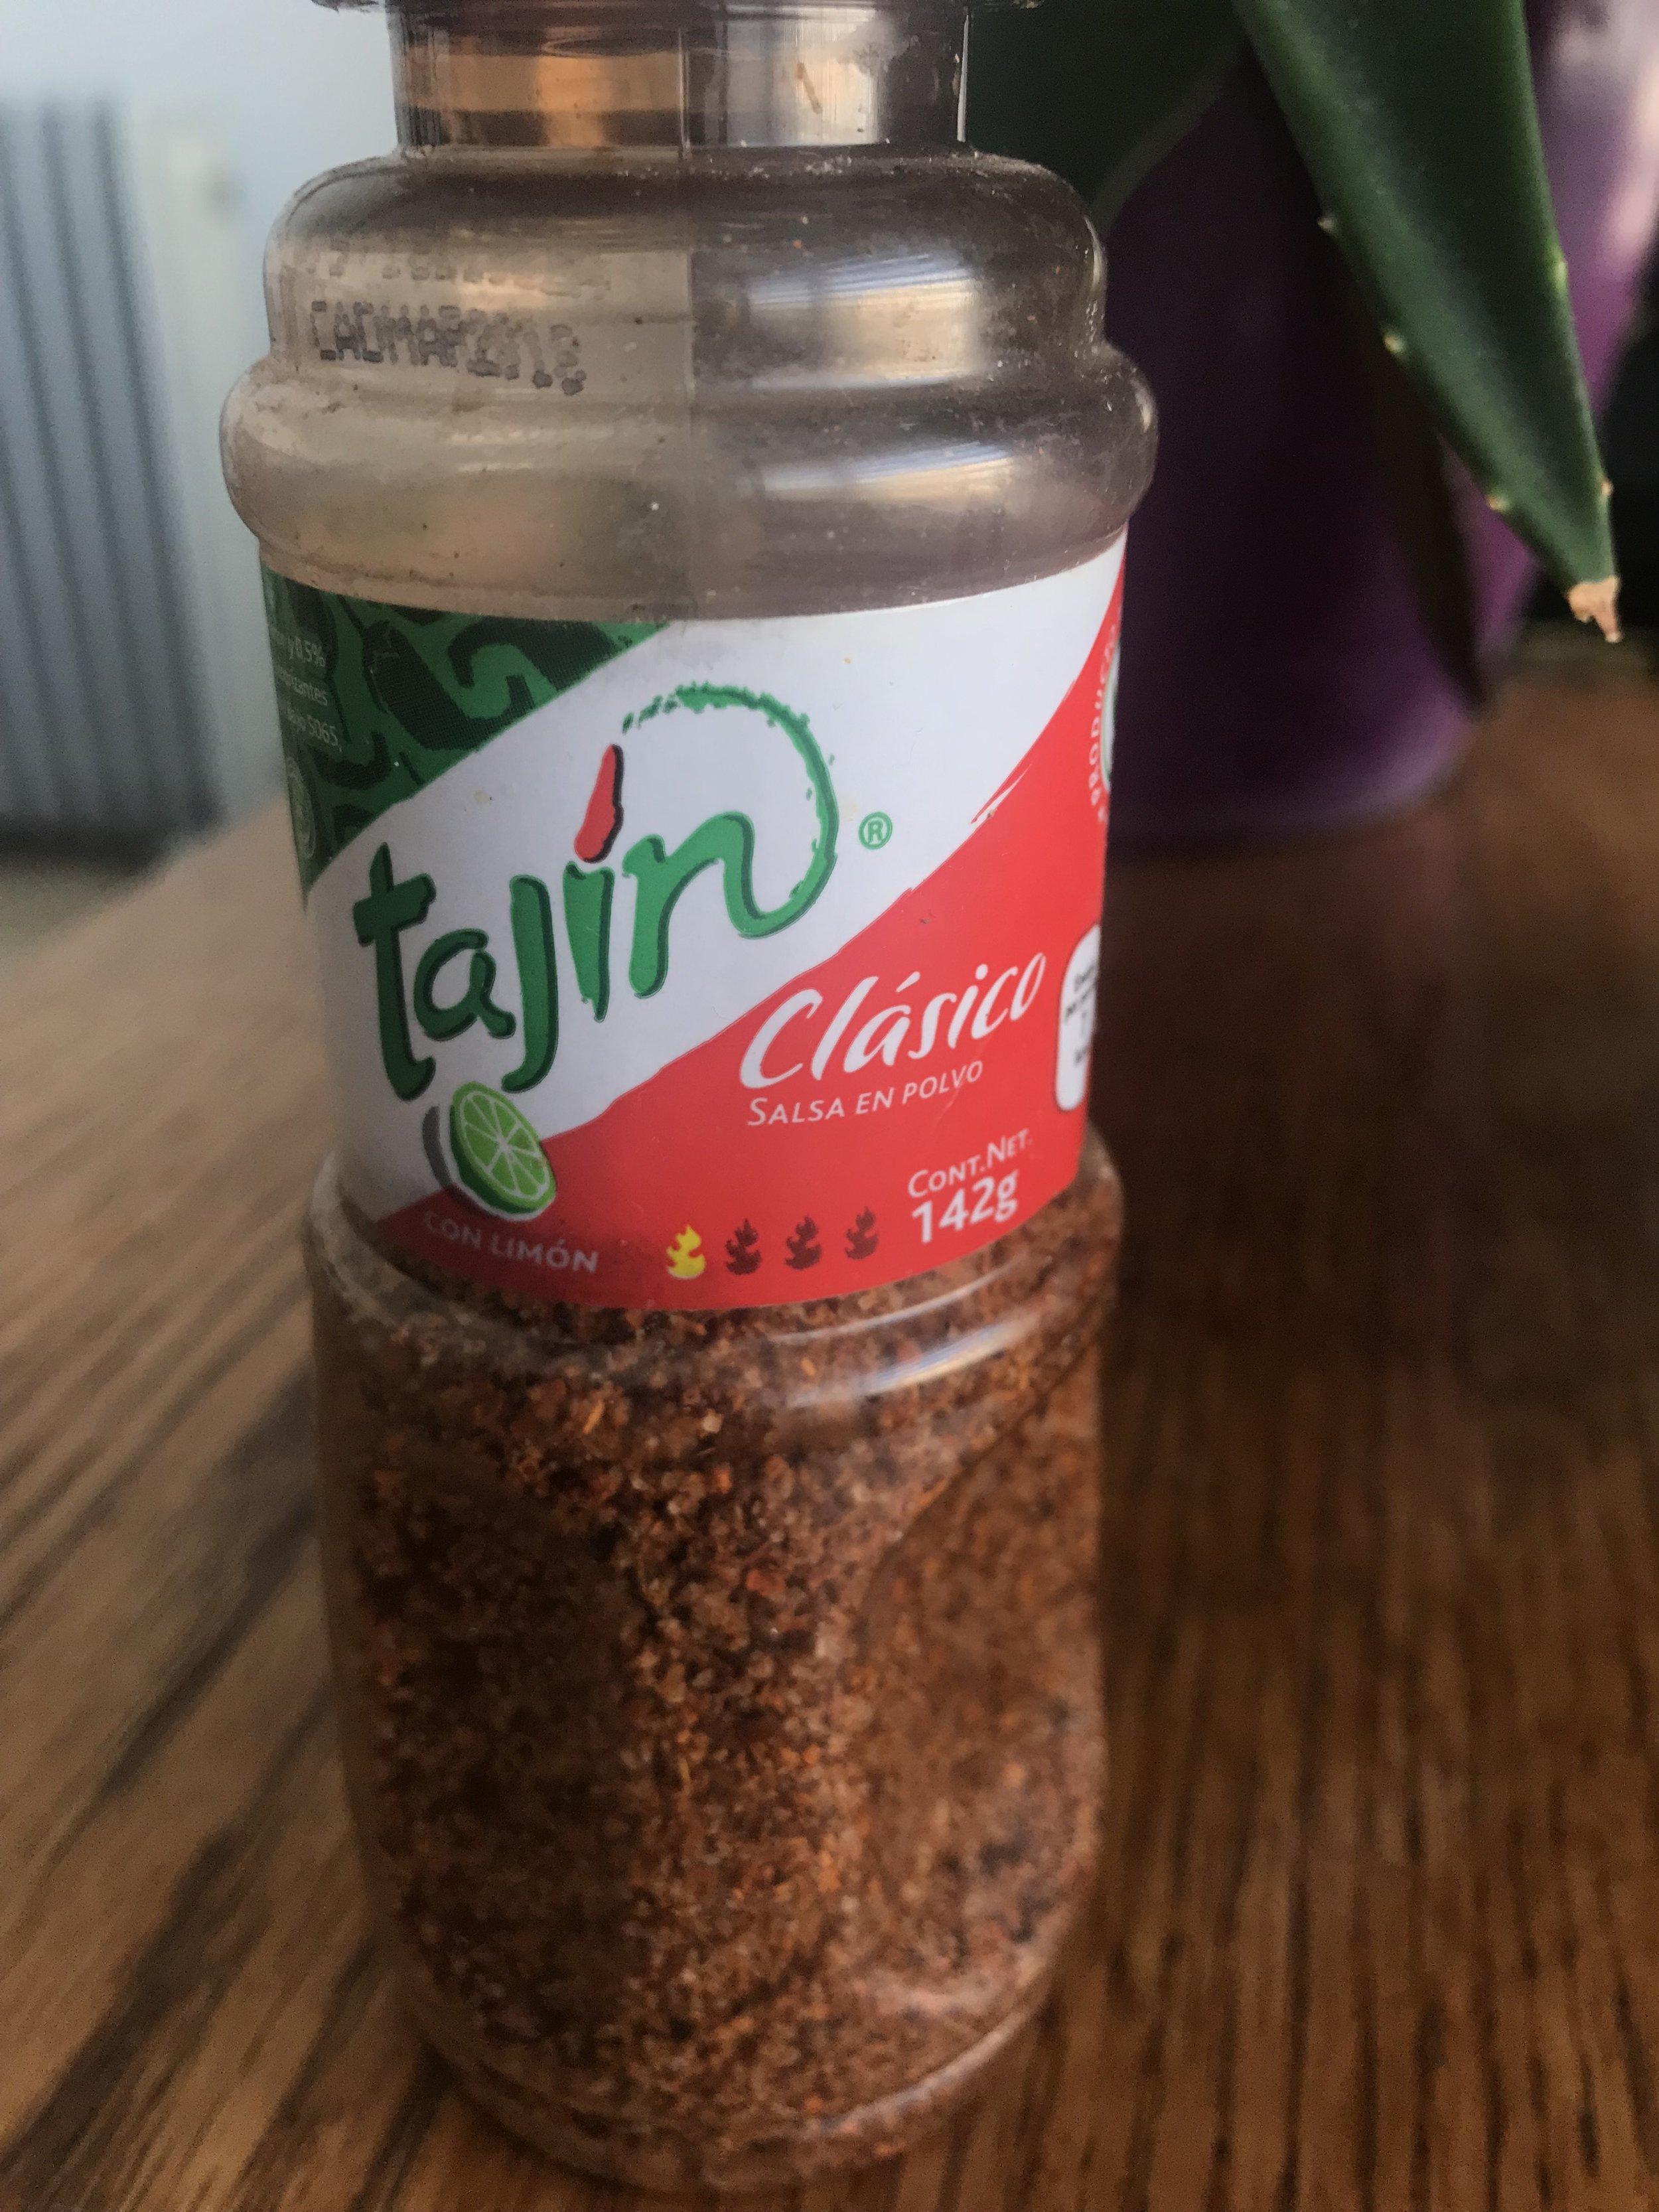 Tajin Toasted Sweet Cashews | Vegan Snack, Salad Toppings, Plant-Based Appetizer, Oil-Free  © Elena Hollenhorst